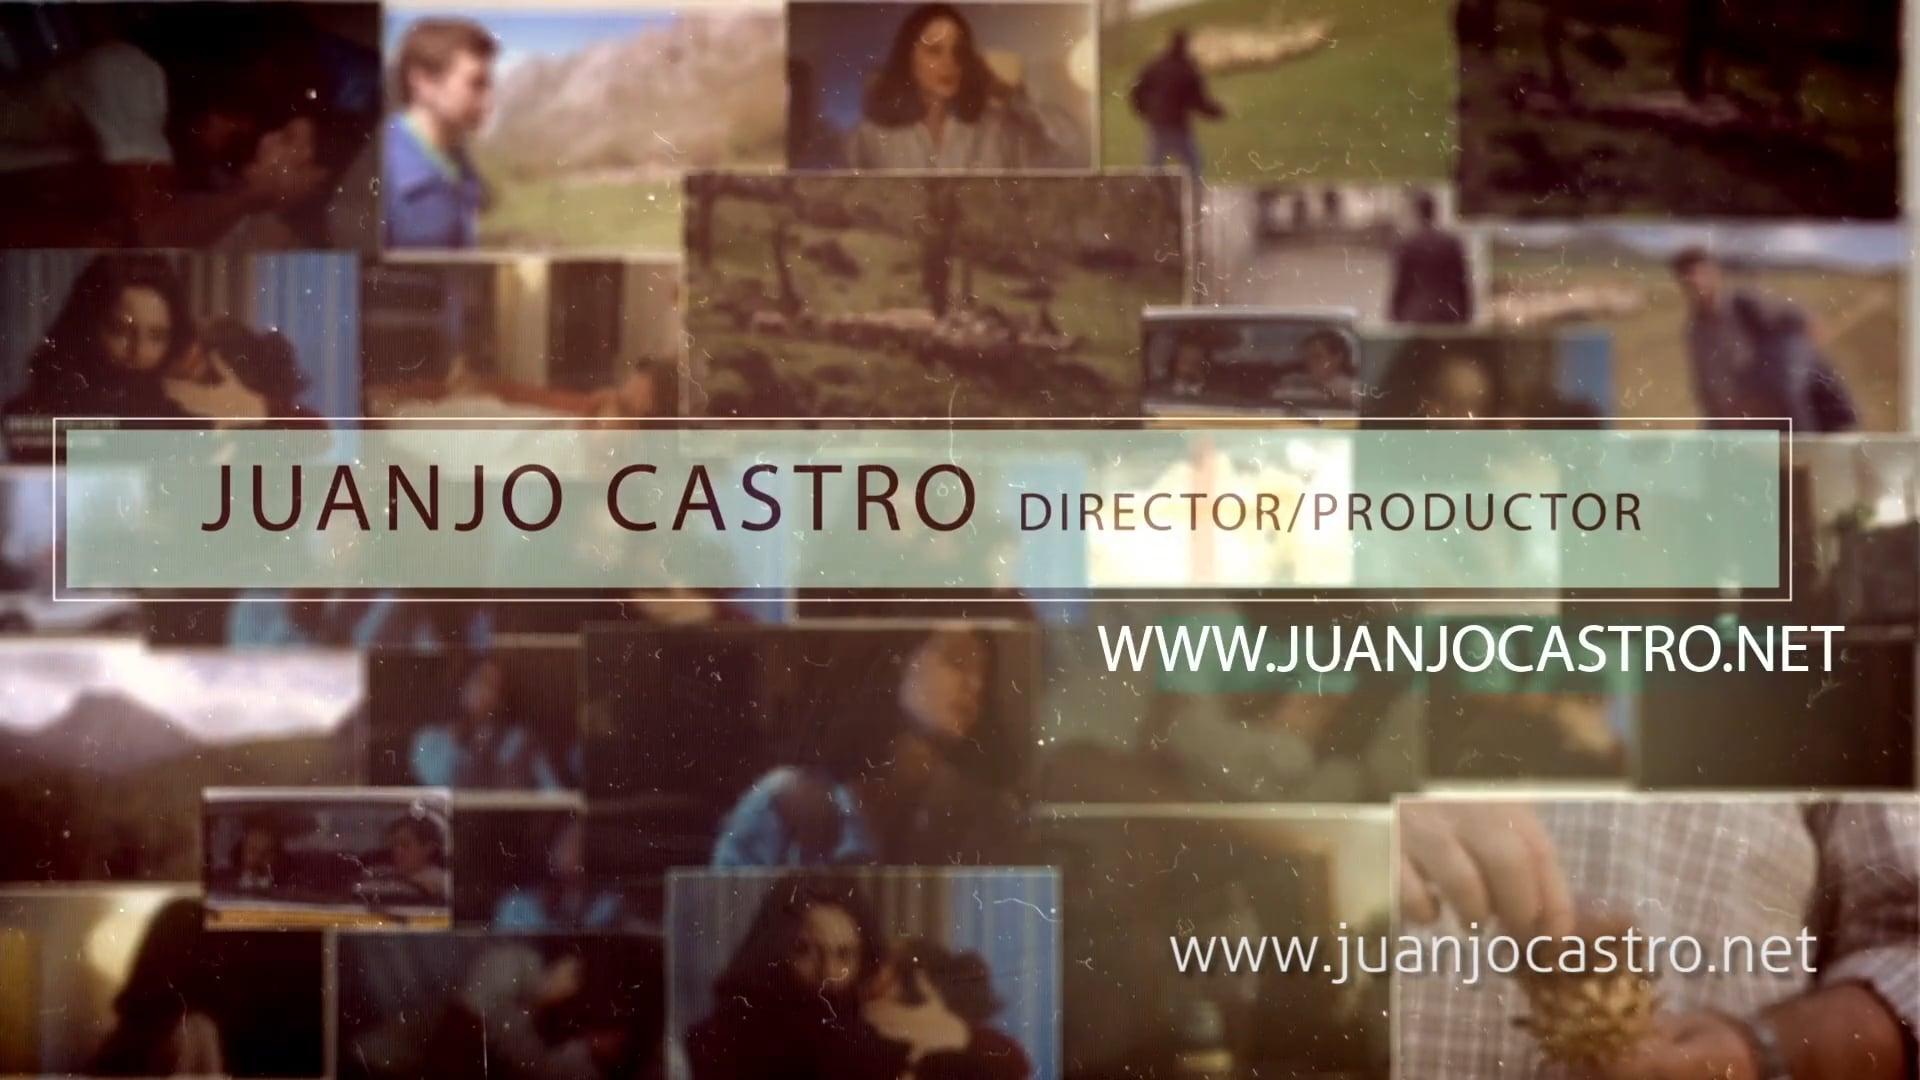 Promo Juanjo Castro Director/Productor (septiembre 15)